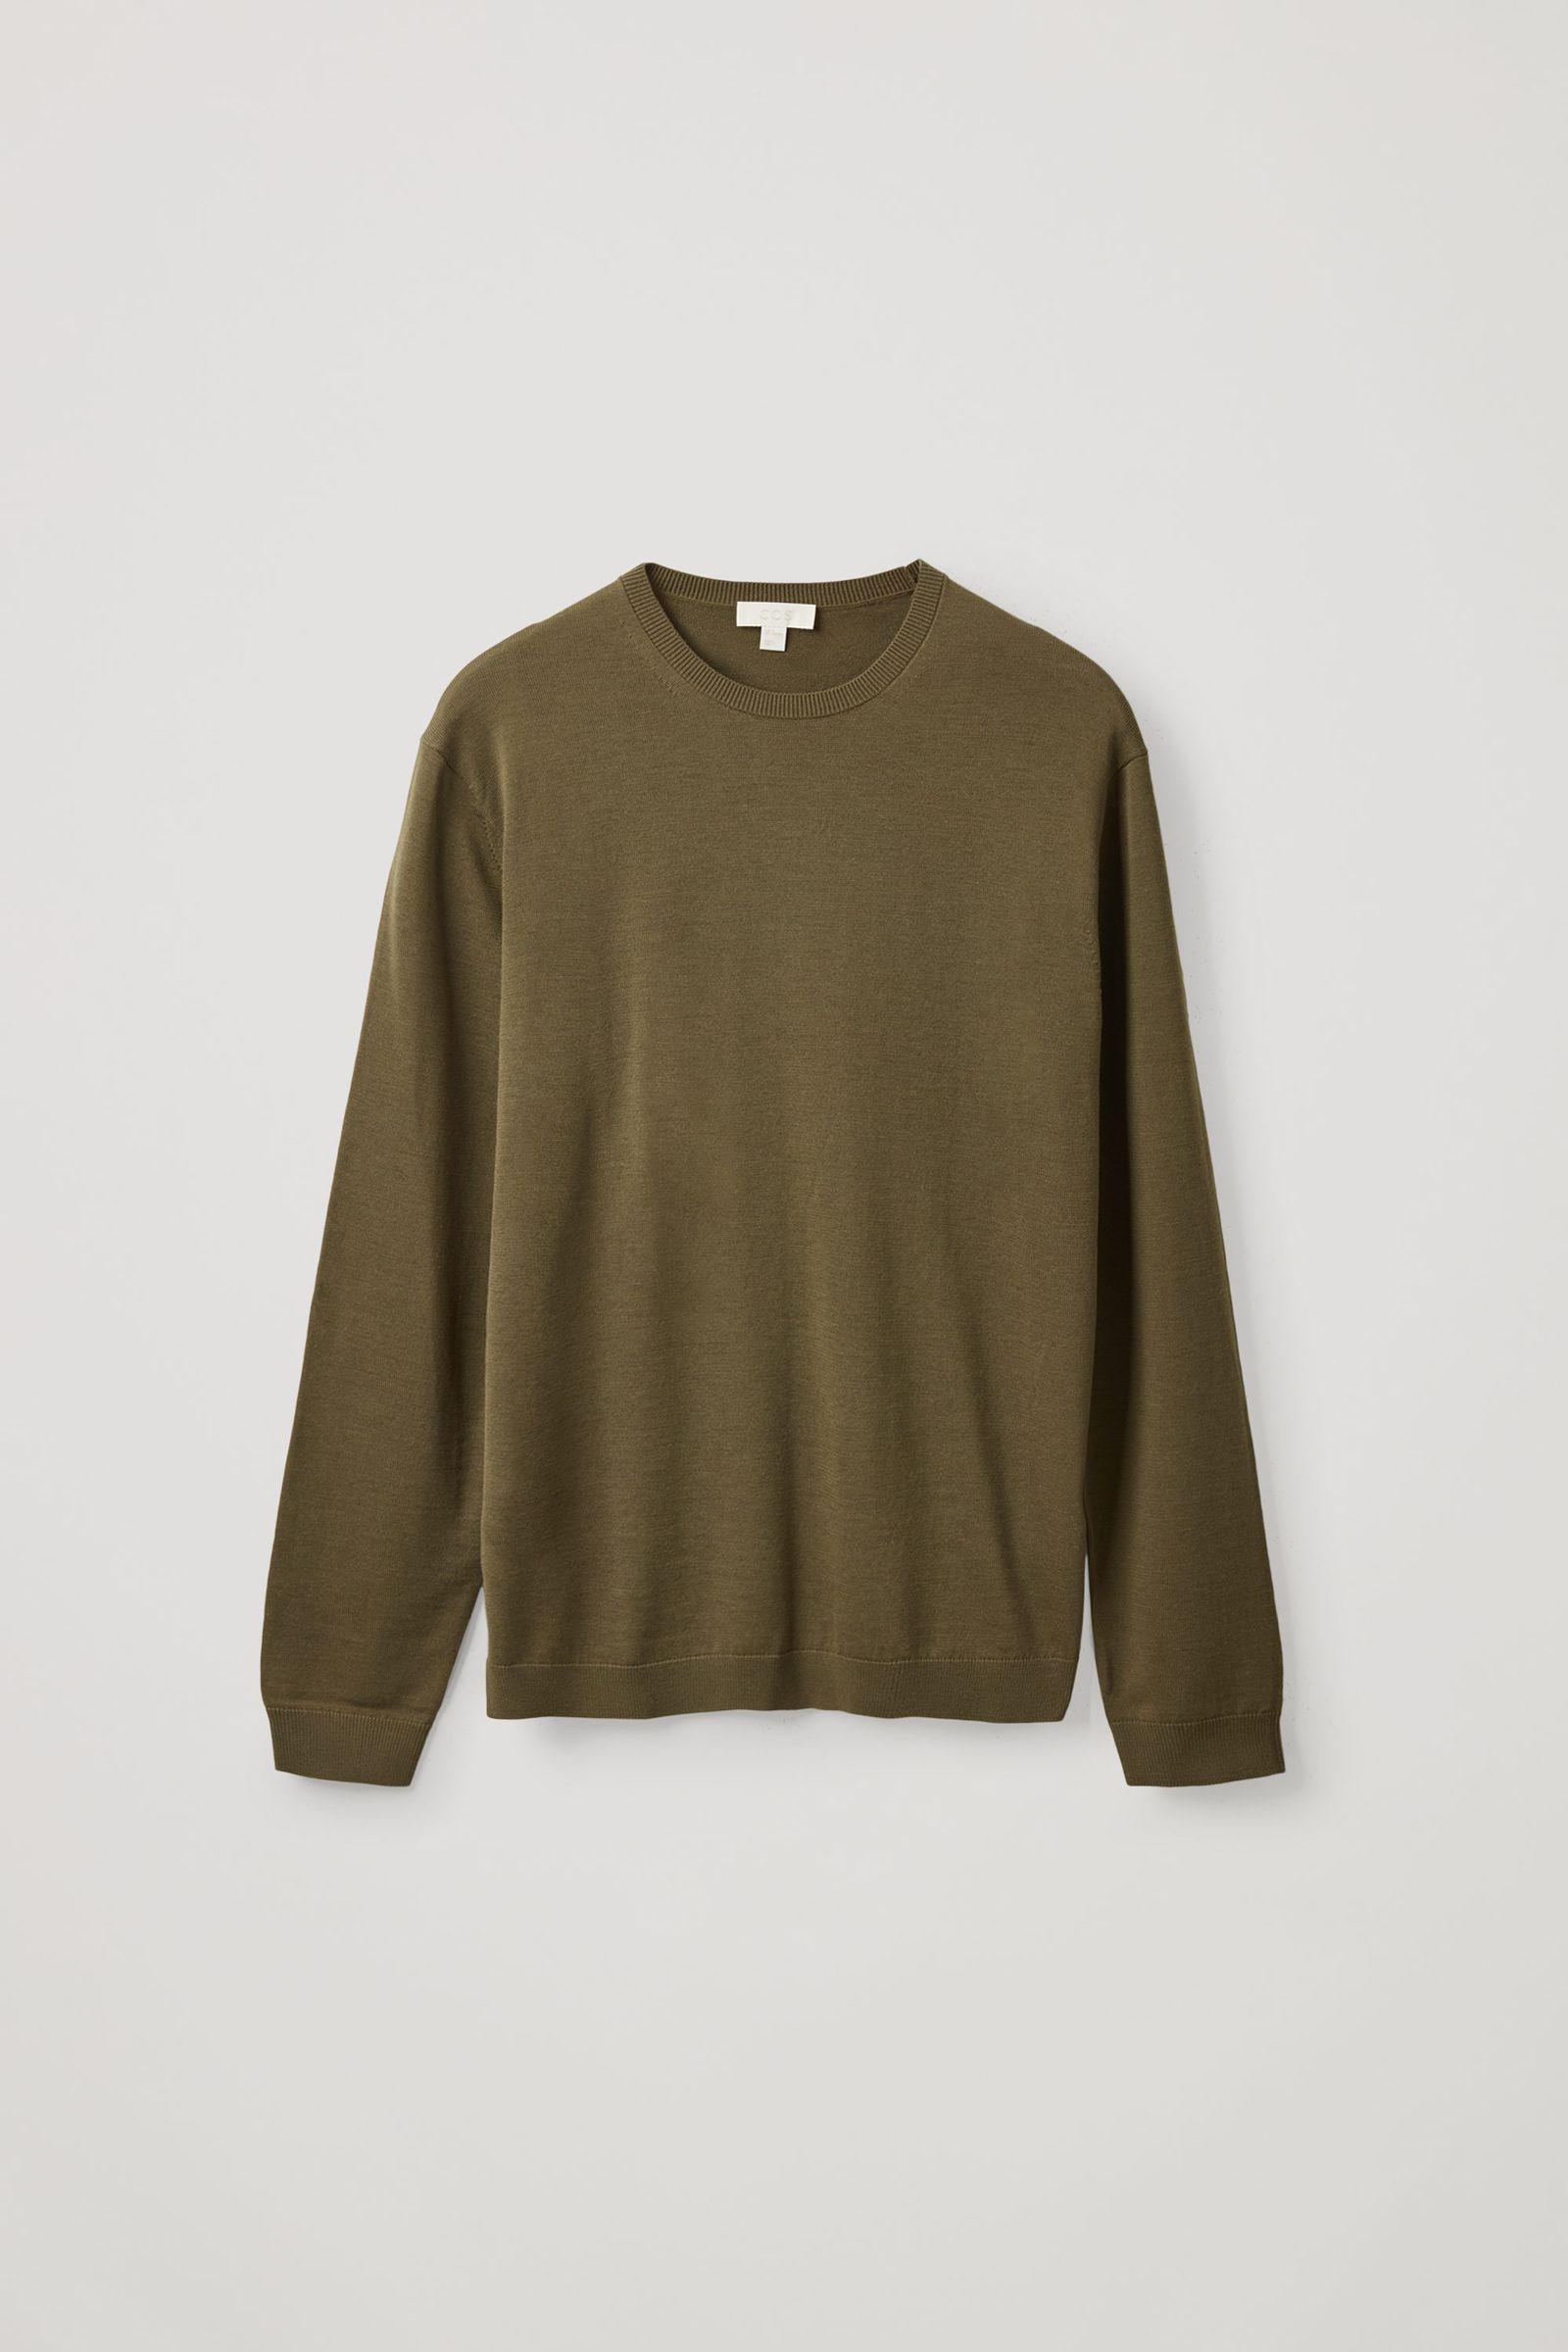 COS 메리노 크루넥 스웨터의 다크 그린컬러 Product입니다.